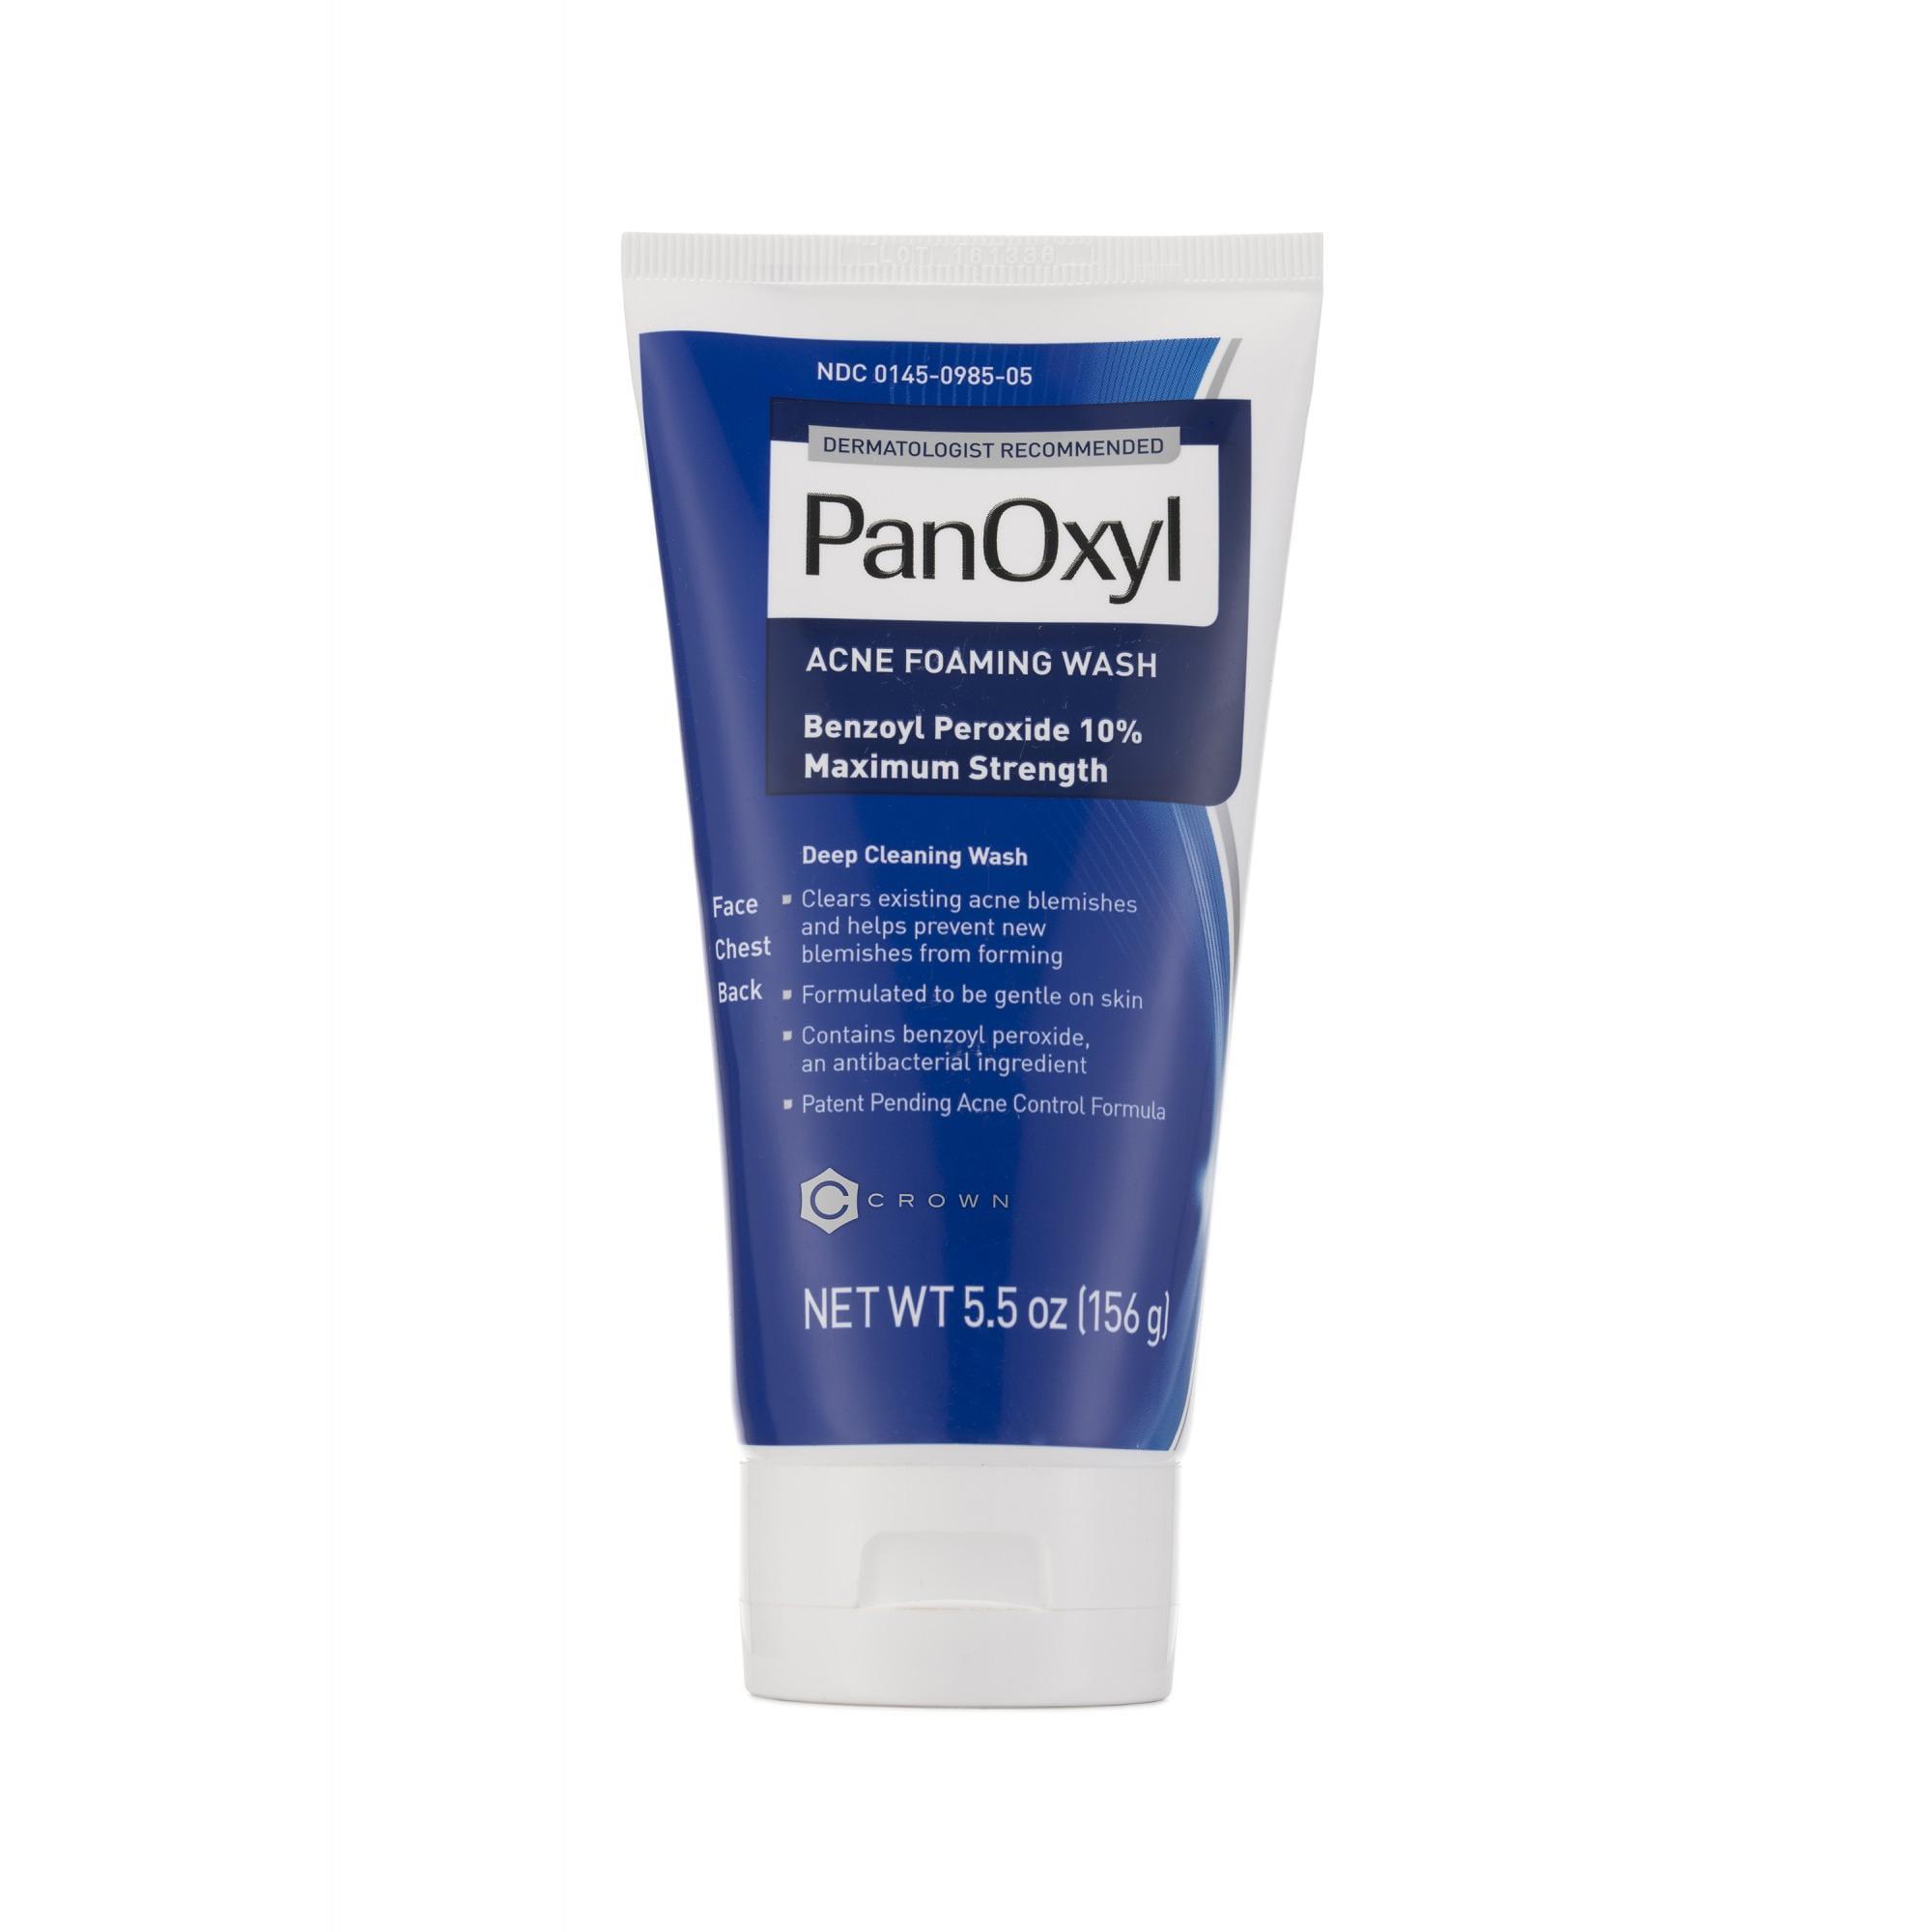 PanOxyl Foaming Acne Wash, Maximum Strength, 10% Benzoyl Peroxide - 5.5 oz - Walmart.com - Walmart.com